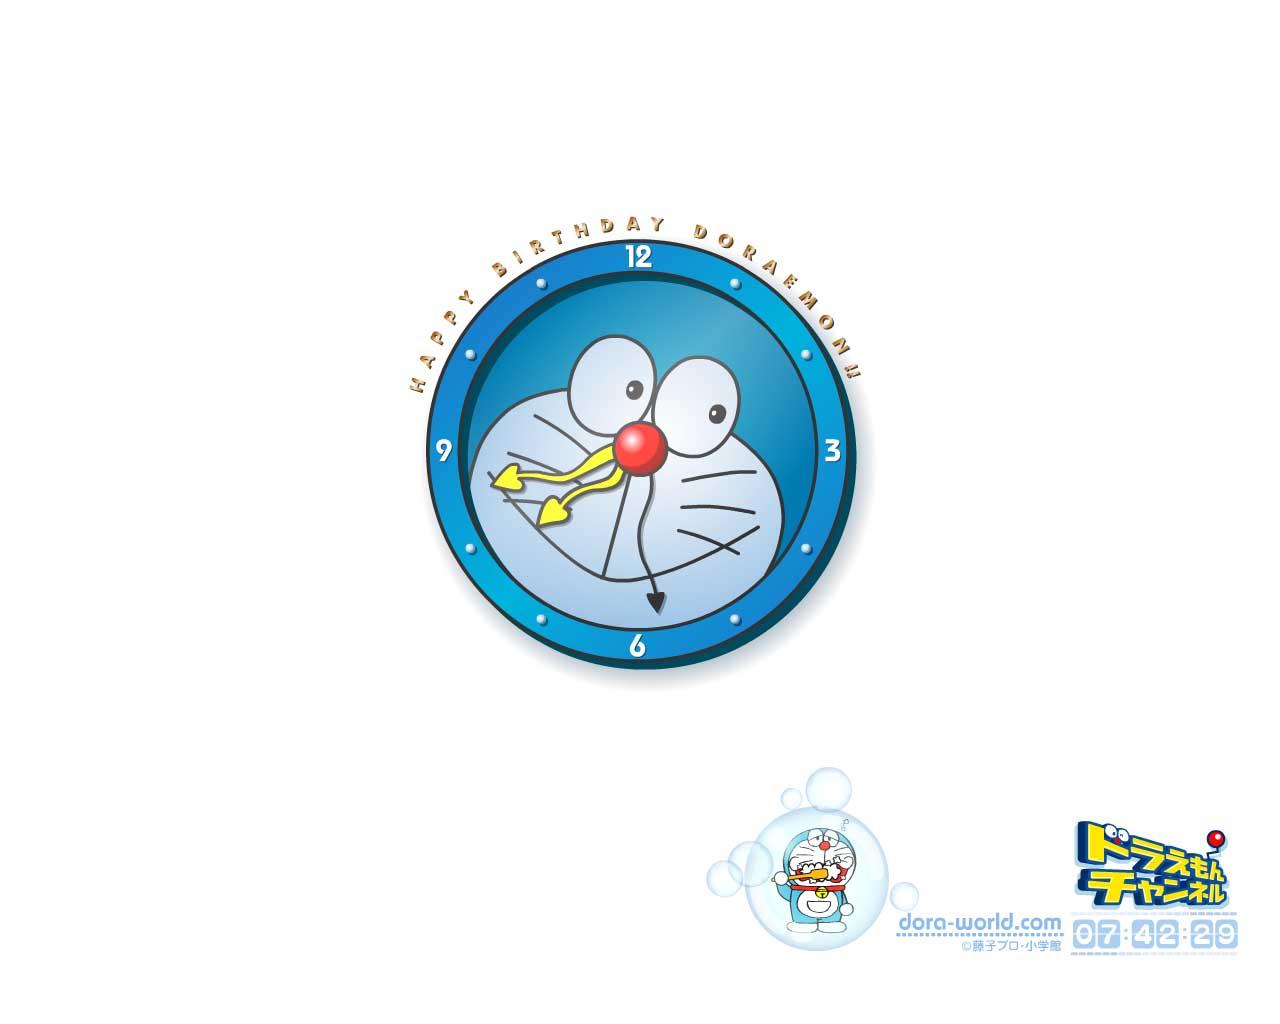 Free Wallpaper Doraemon Lucu MUP Rijeka [